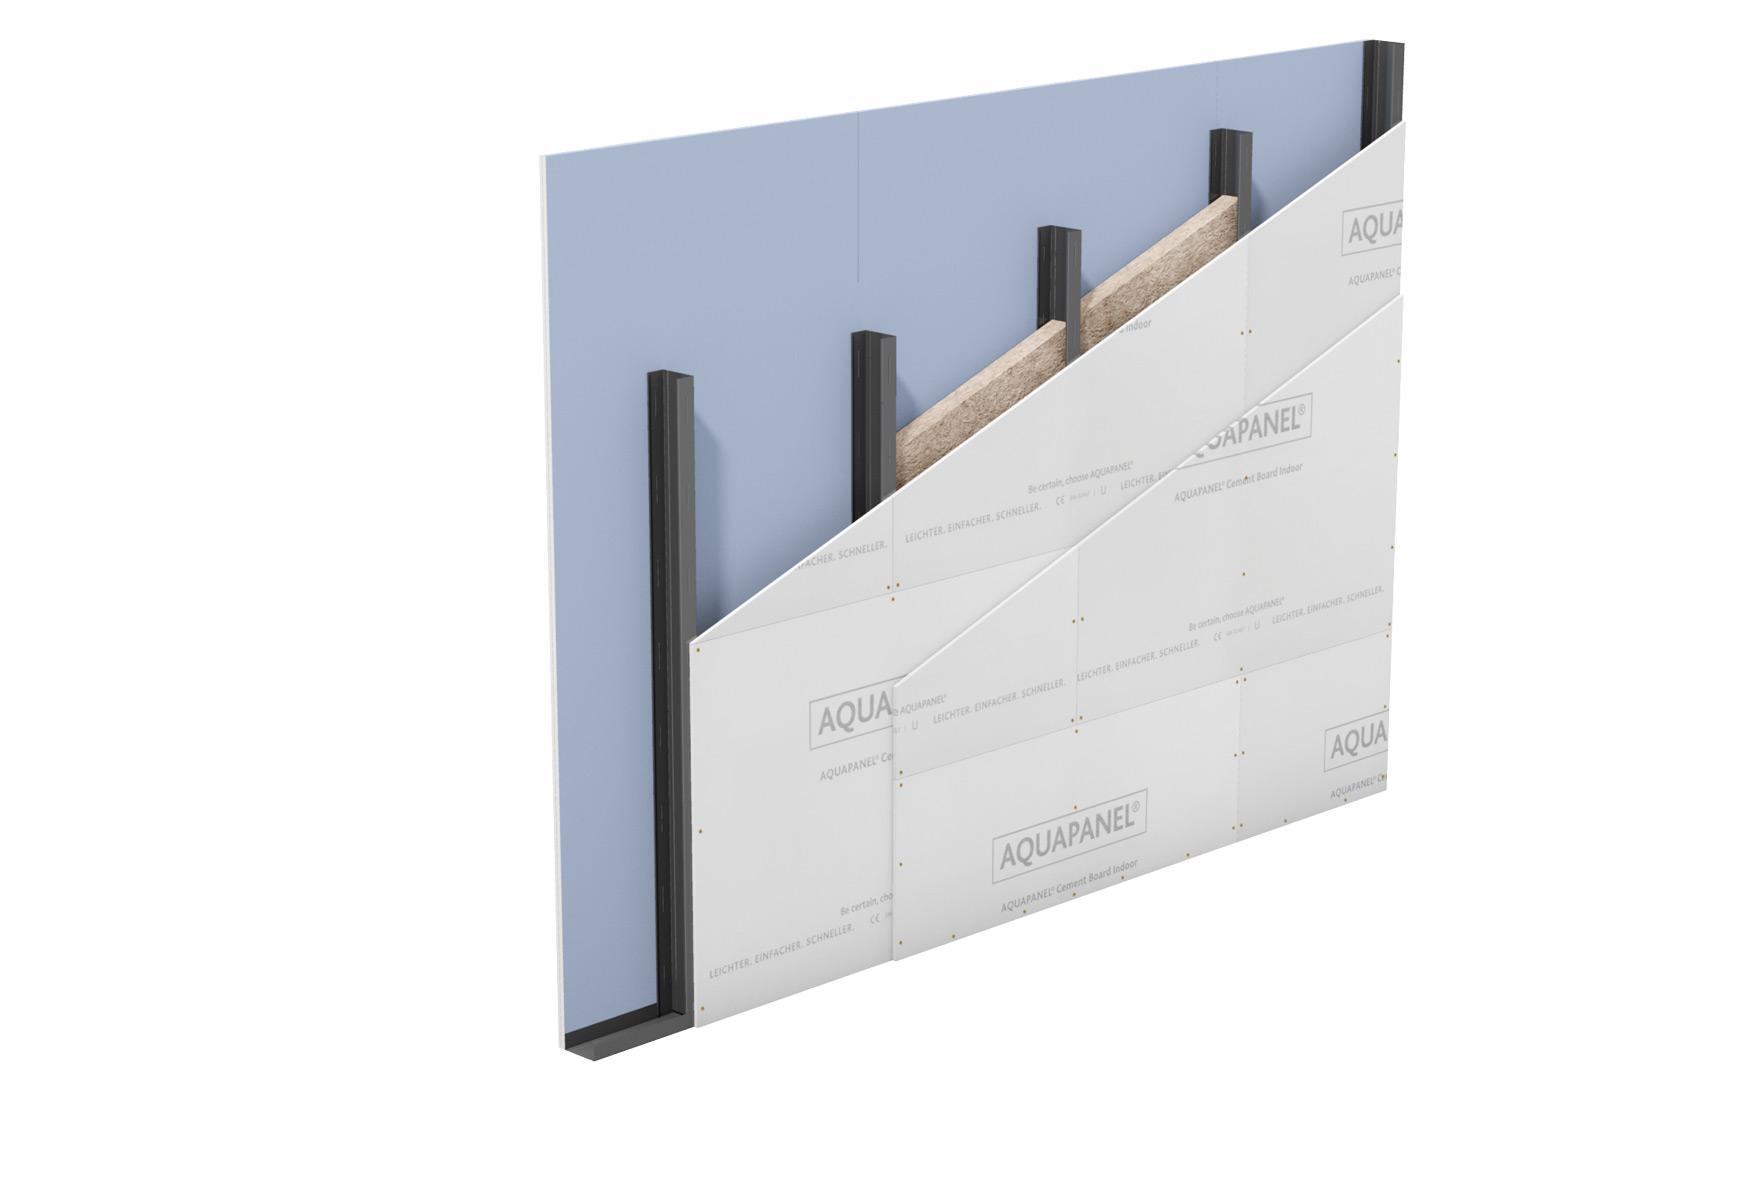 Knauf tu aquapanel cement board indoor